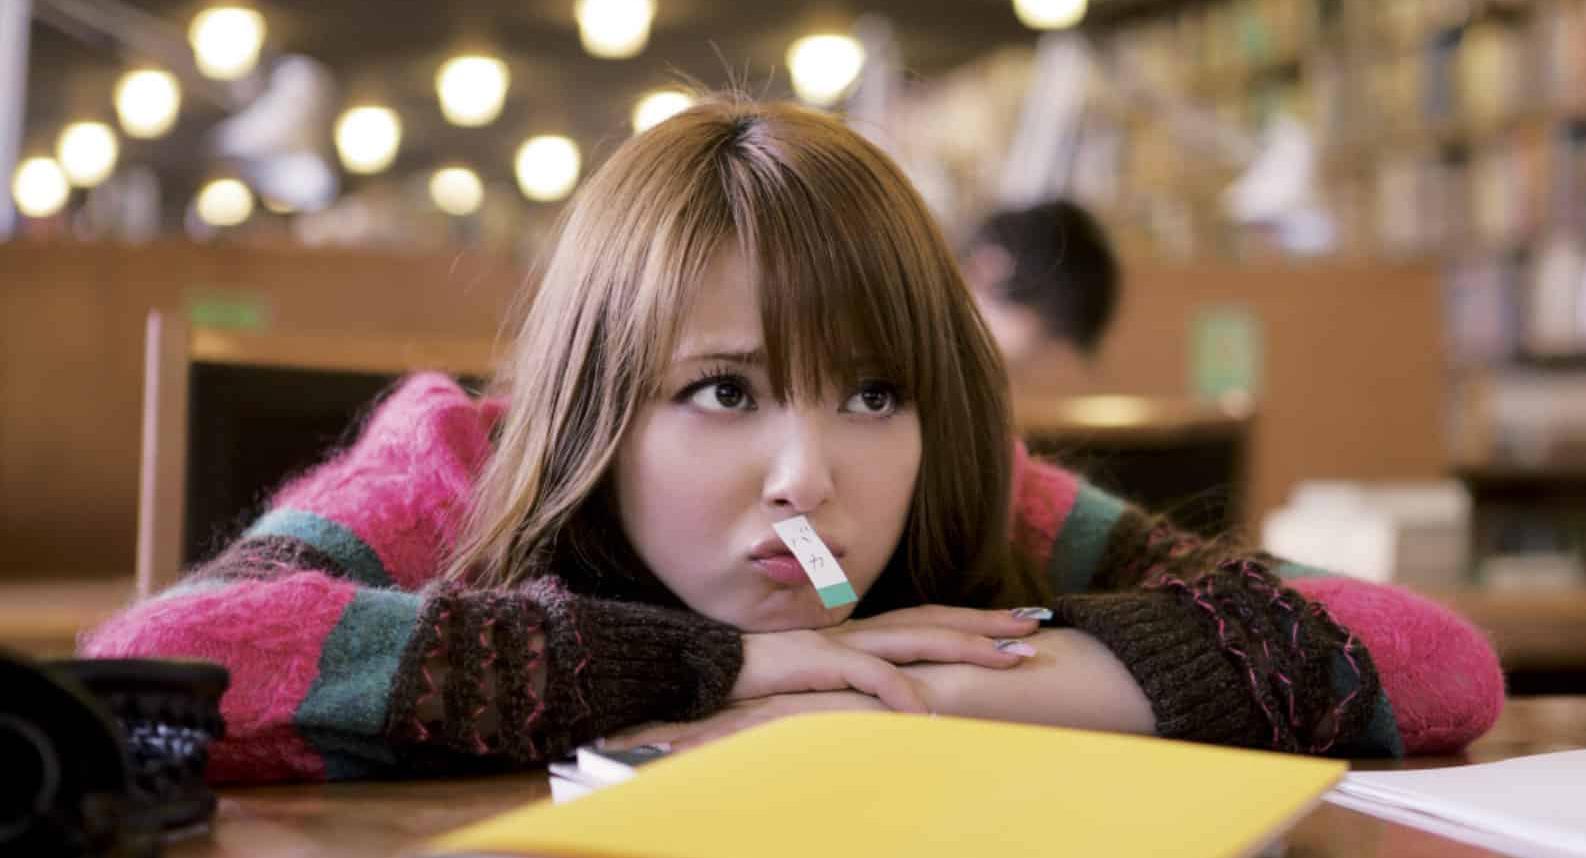 Yah Salah satu isu yang paling sering muncul jika kita membahas wanita Jepang adalah kebanyakan remaja jepang sudah kehilangan perawan mereka sejak masih berstatus Siswi sekolah menengah.